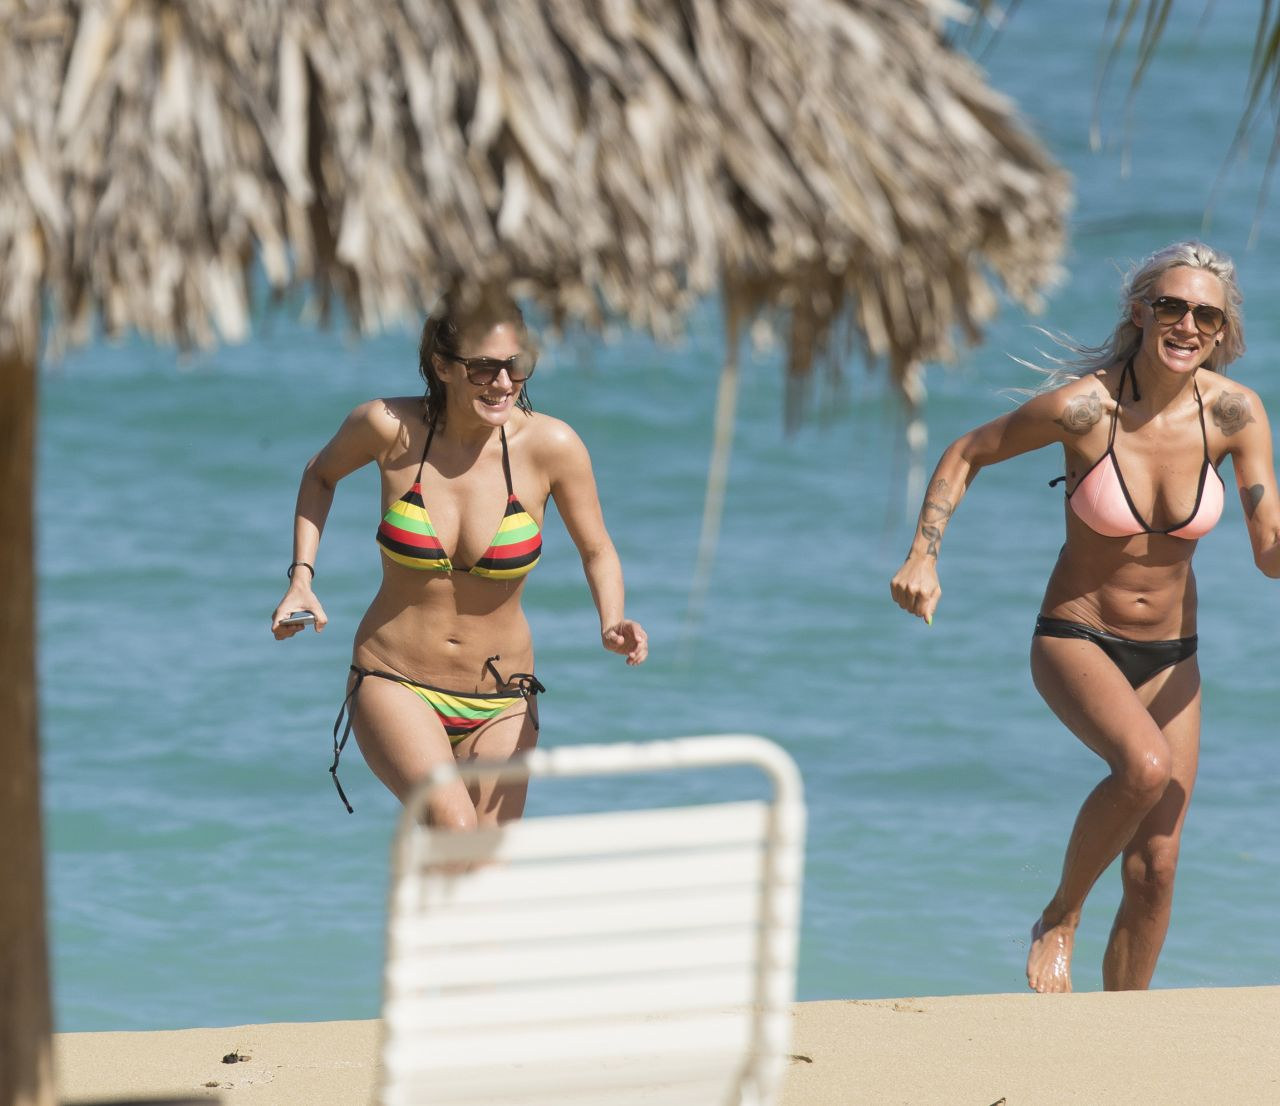 Caroline Flack Bikini Pics  on the Beach in Jamaica  January 2015